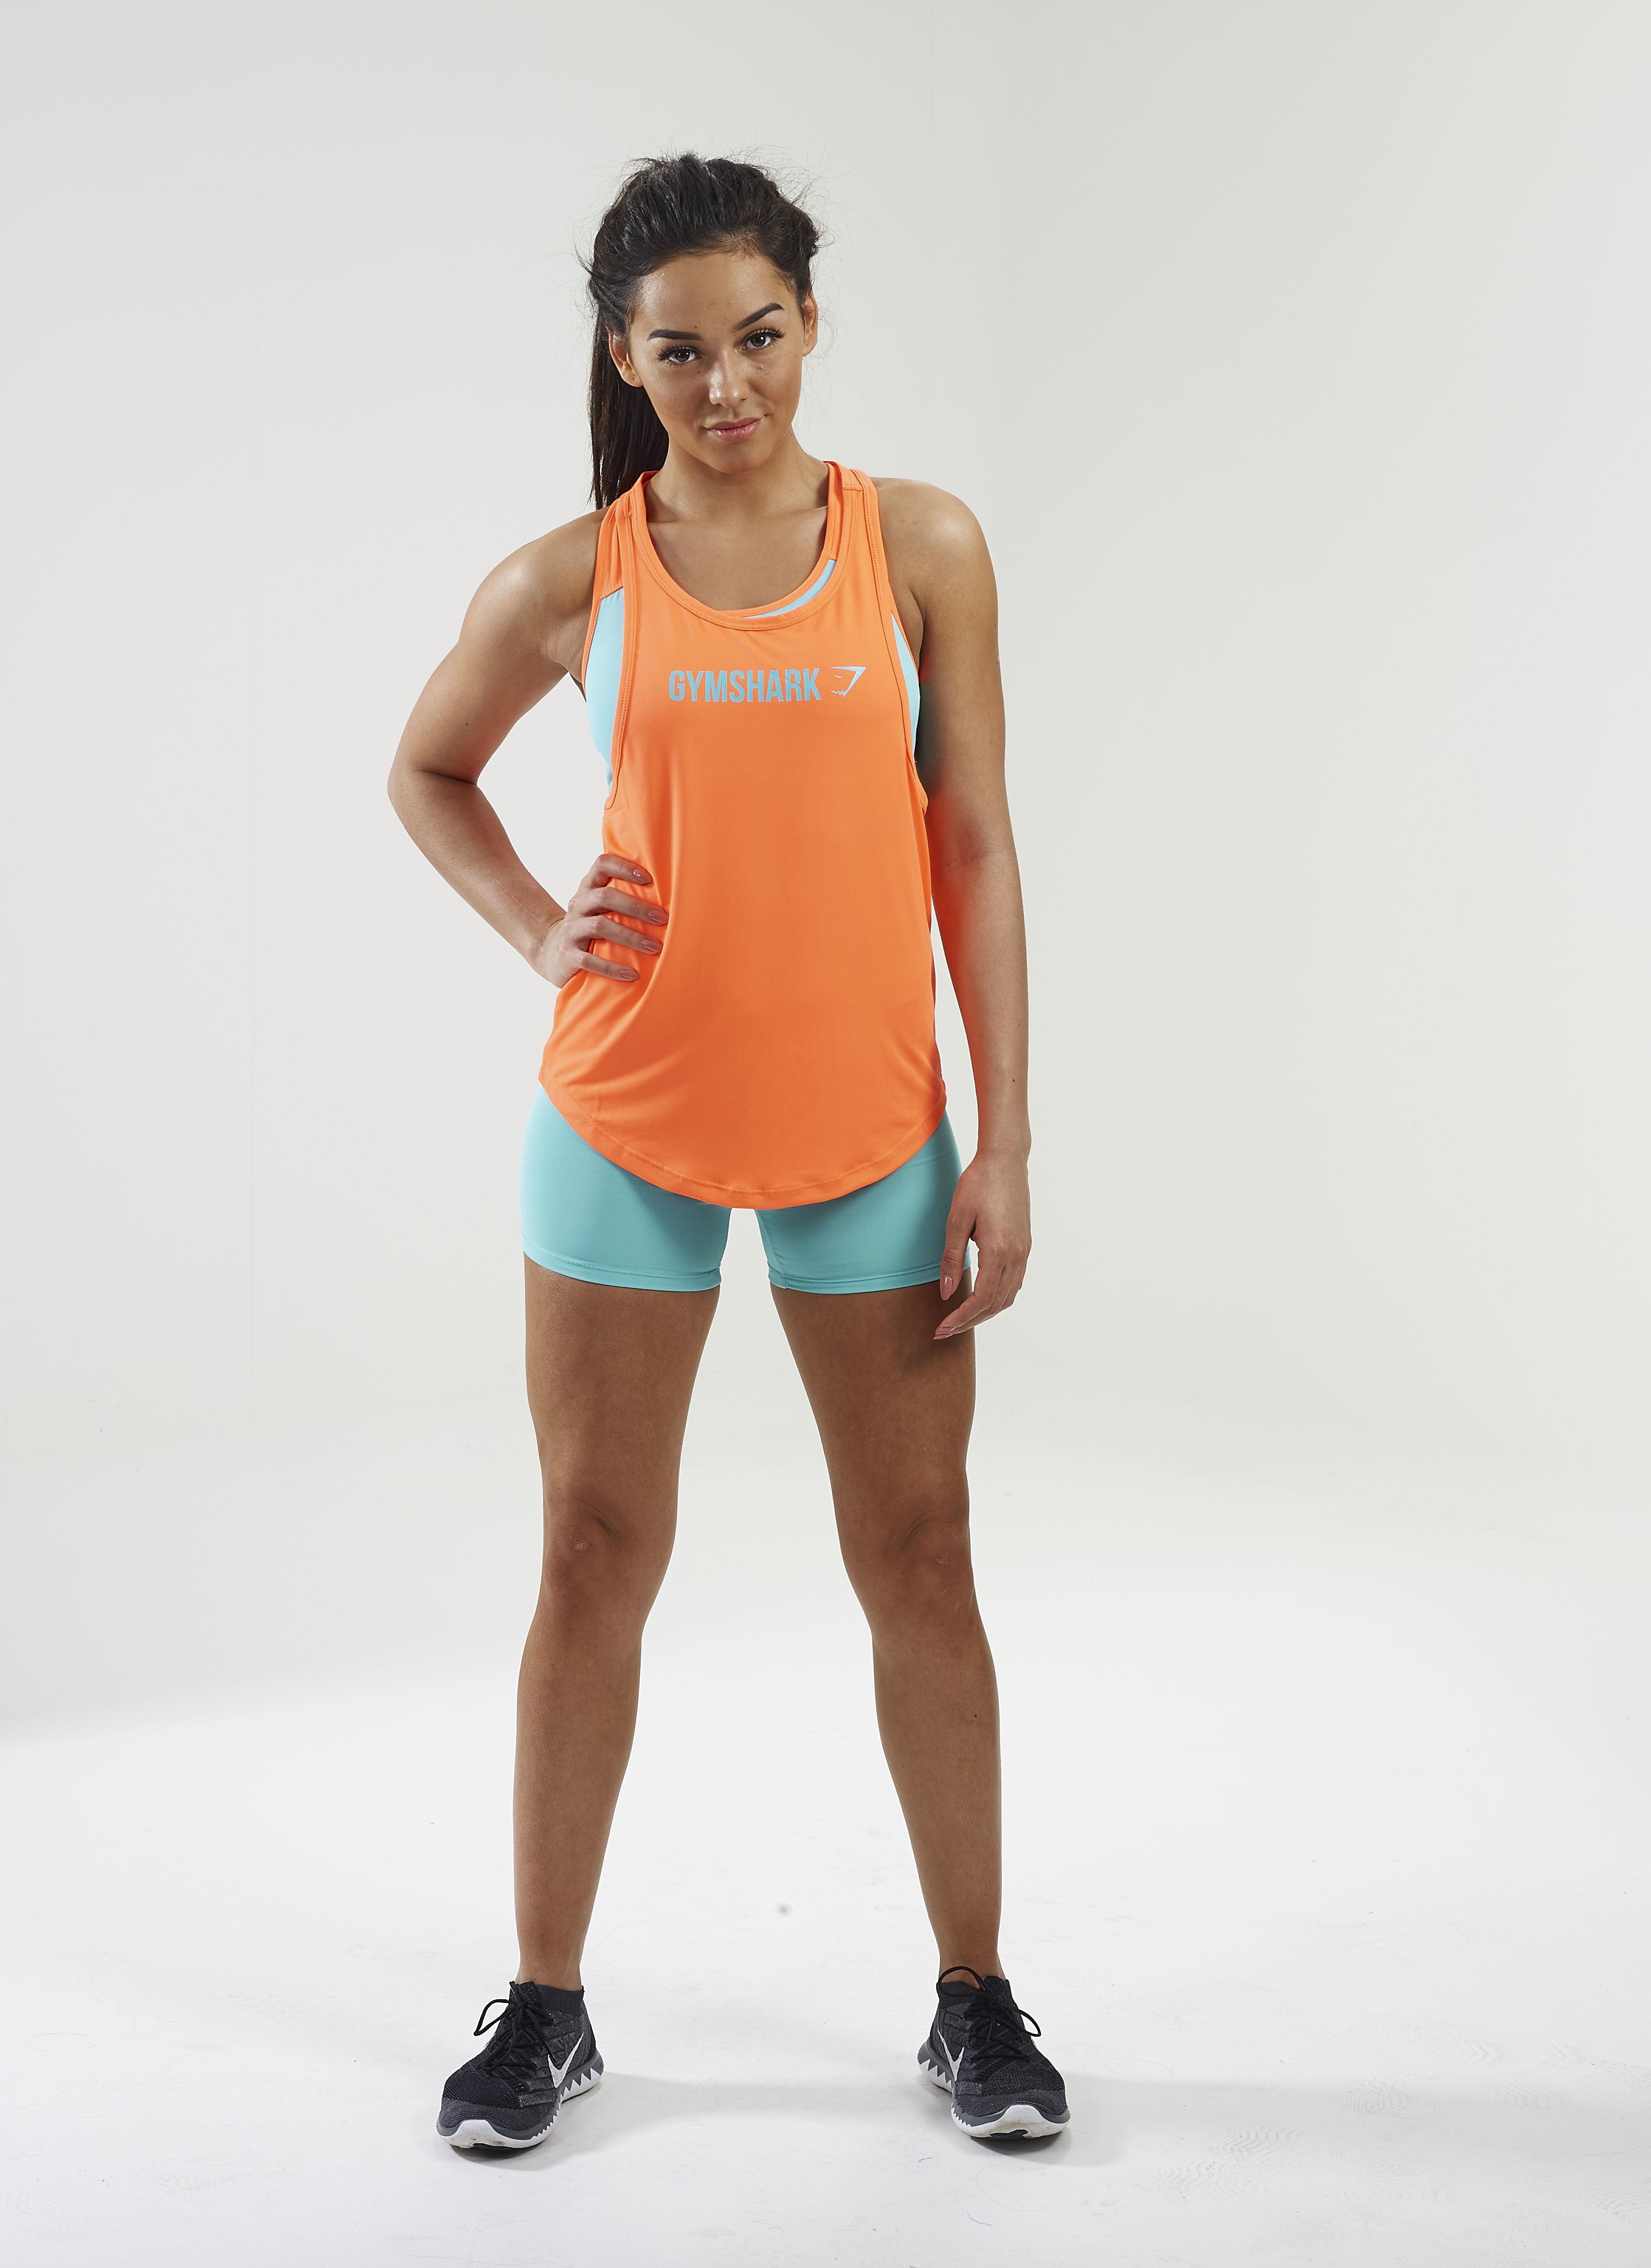 Gymshark Move Racerback Vest. Order yours > https://www.gymshark.com/collections/t-shirts-tops/womensGymshark